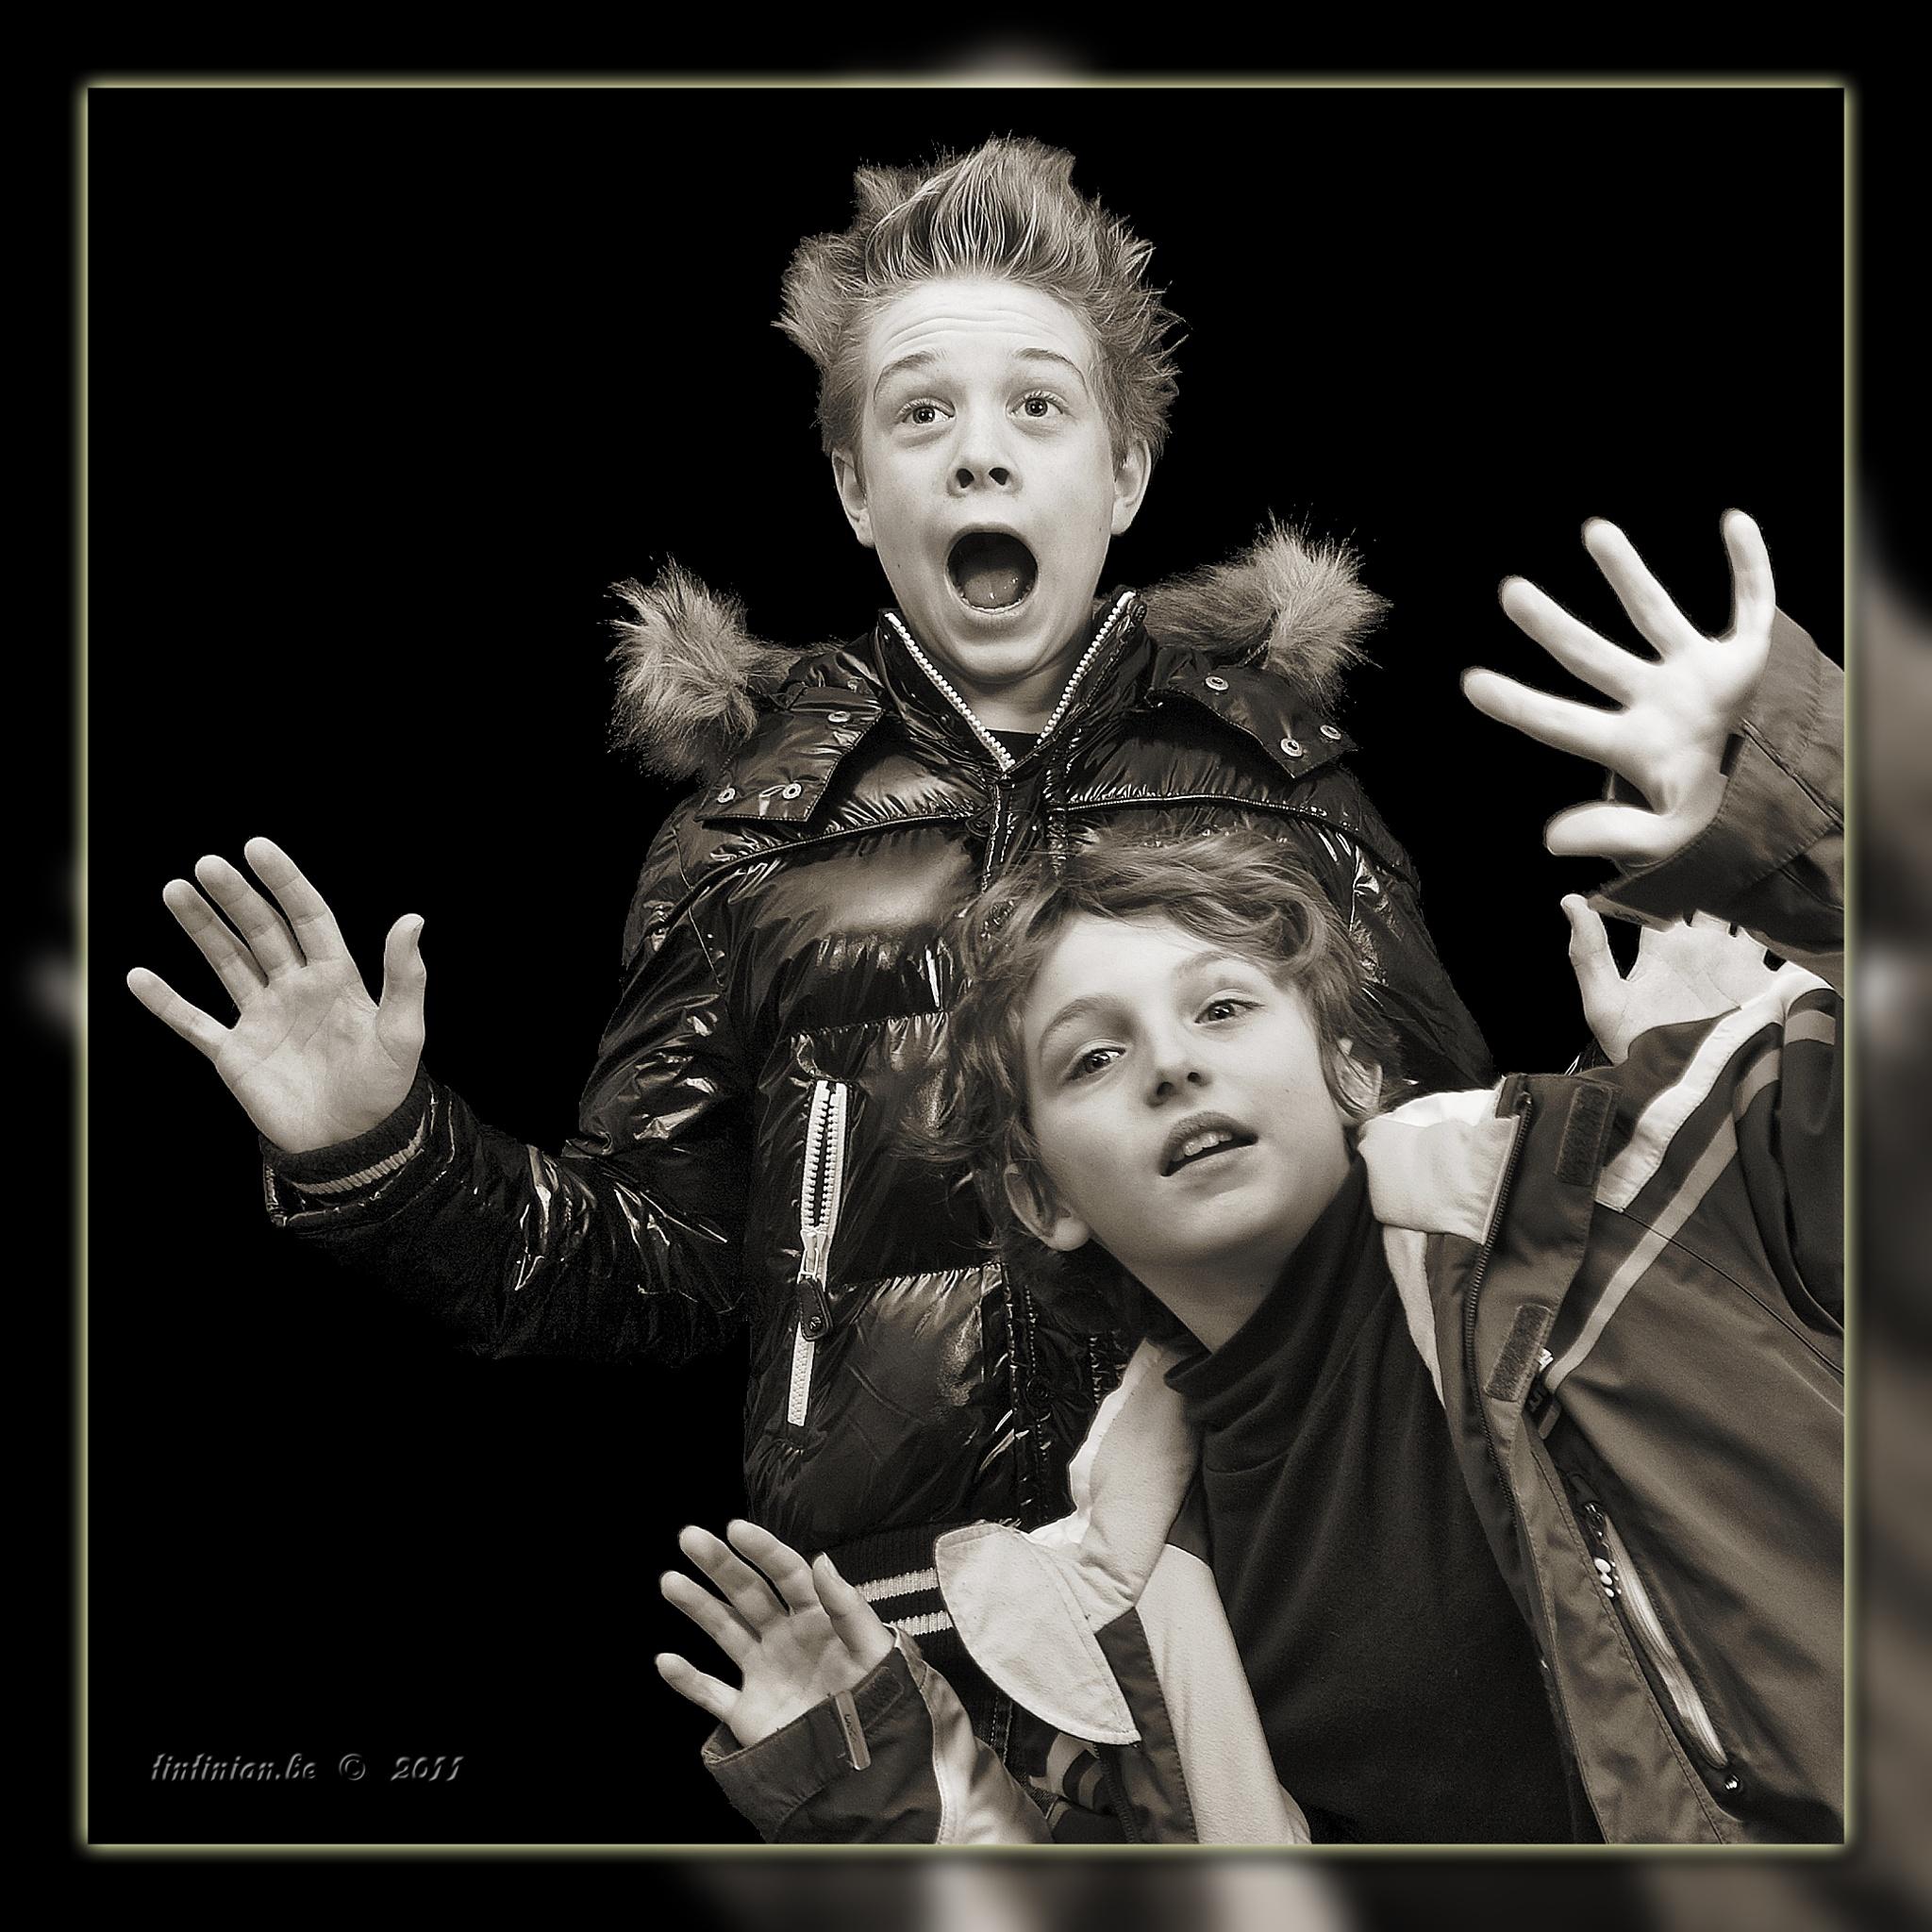 2 Grandsons by Etienne de Maeyer